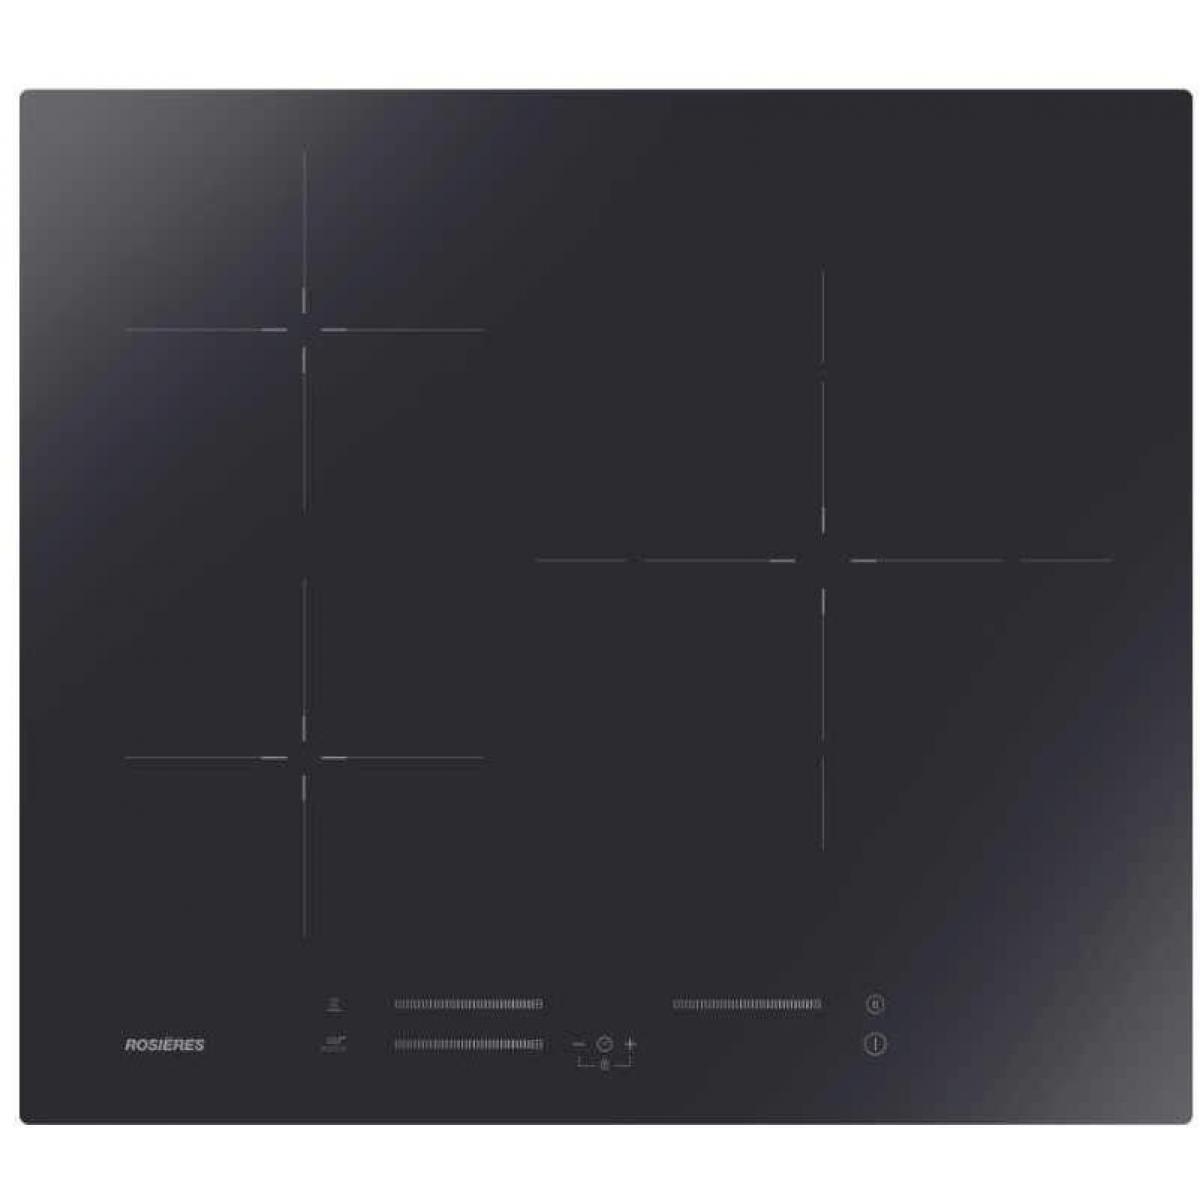 Rosieres Plaque induction ROSIèRES 7100W 59cm, RCM 633 IS